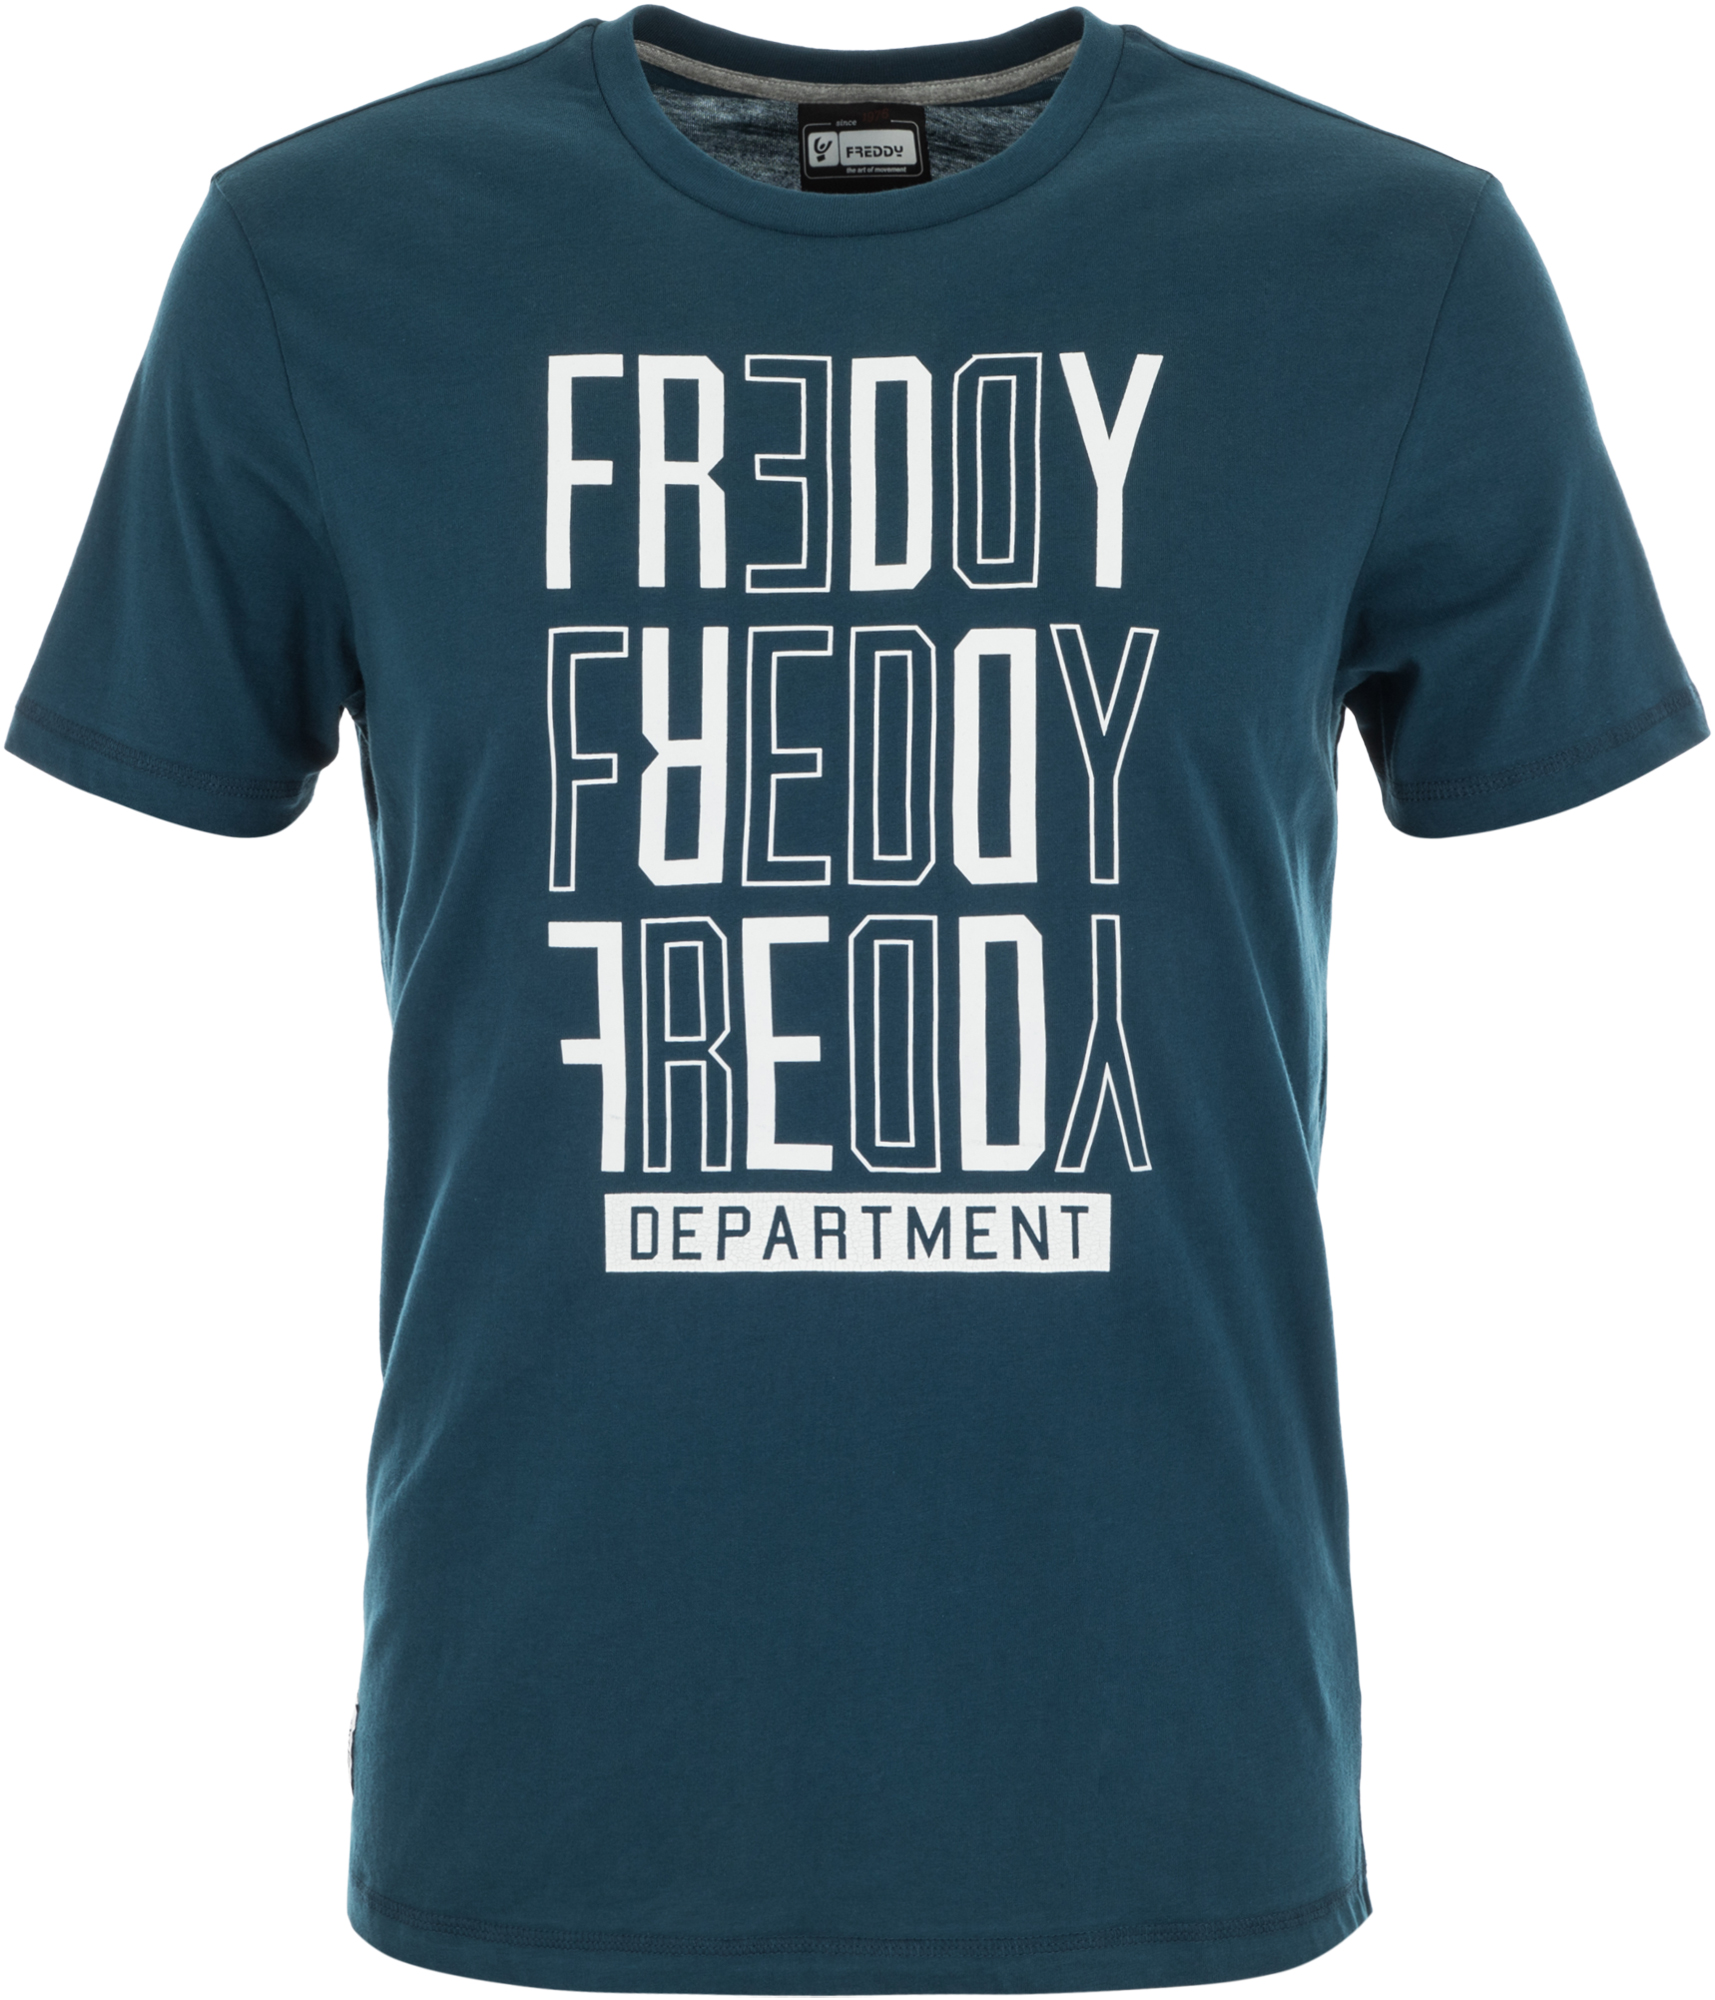 Freddy Футболка мужская Freddy Training, размер 52-54 недорго, оригинальная цена